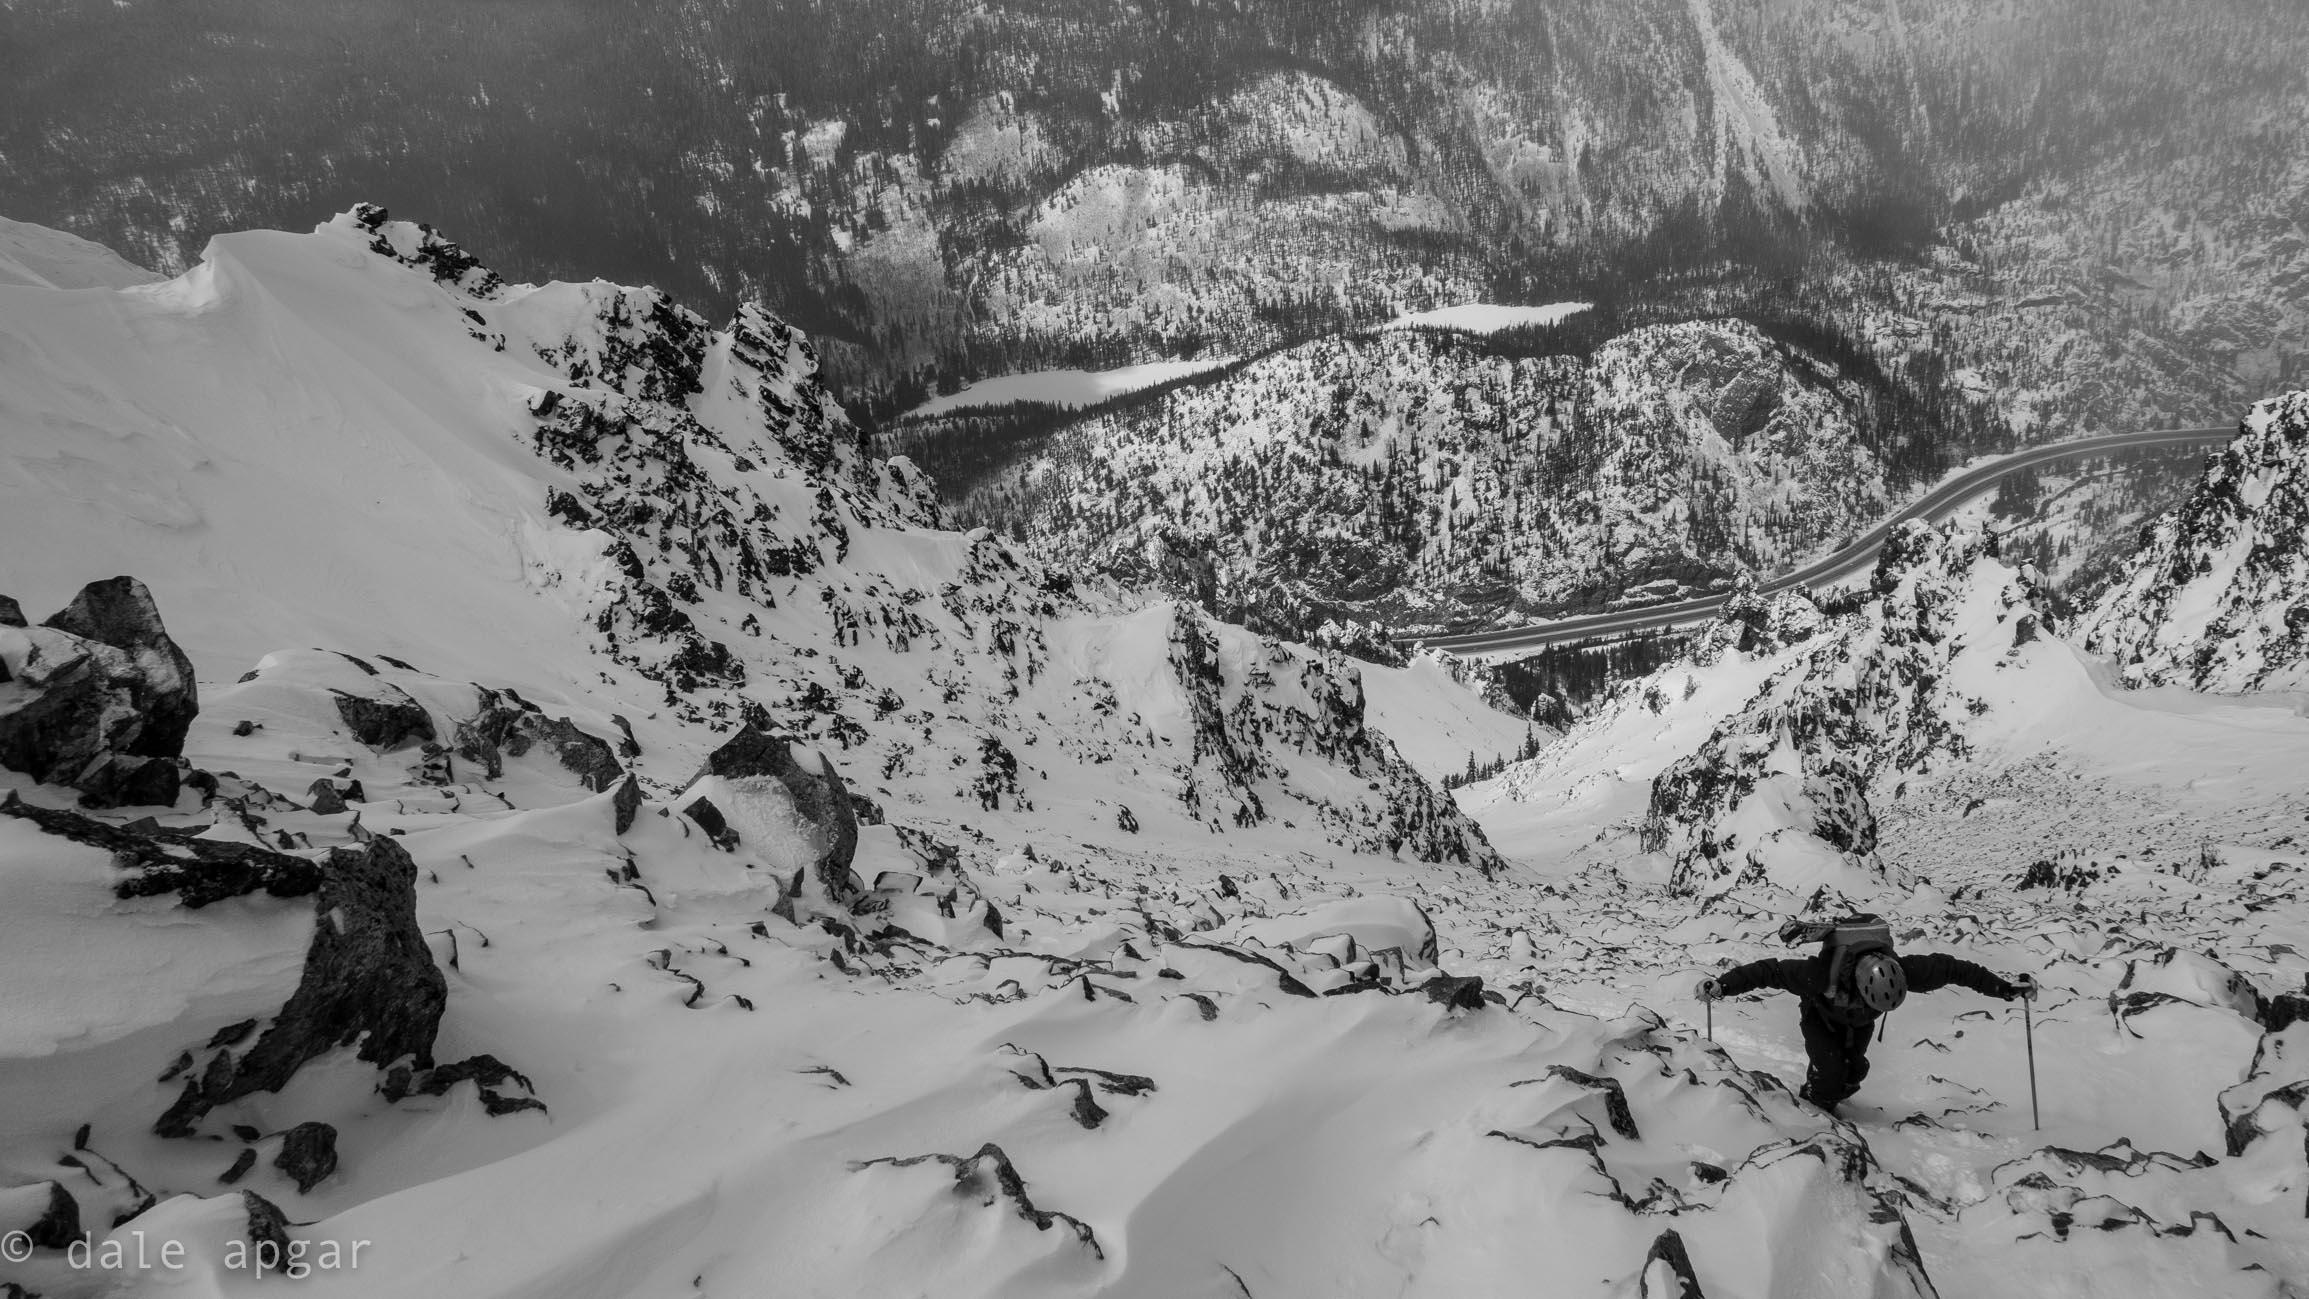 dale_apgar_ski-28.jpg